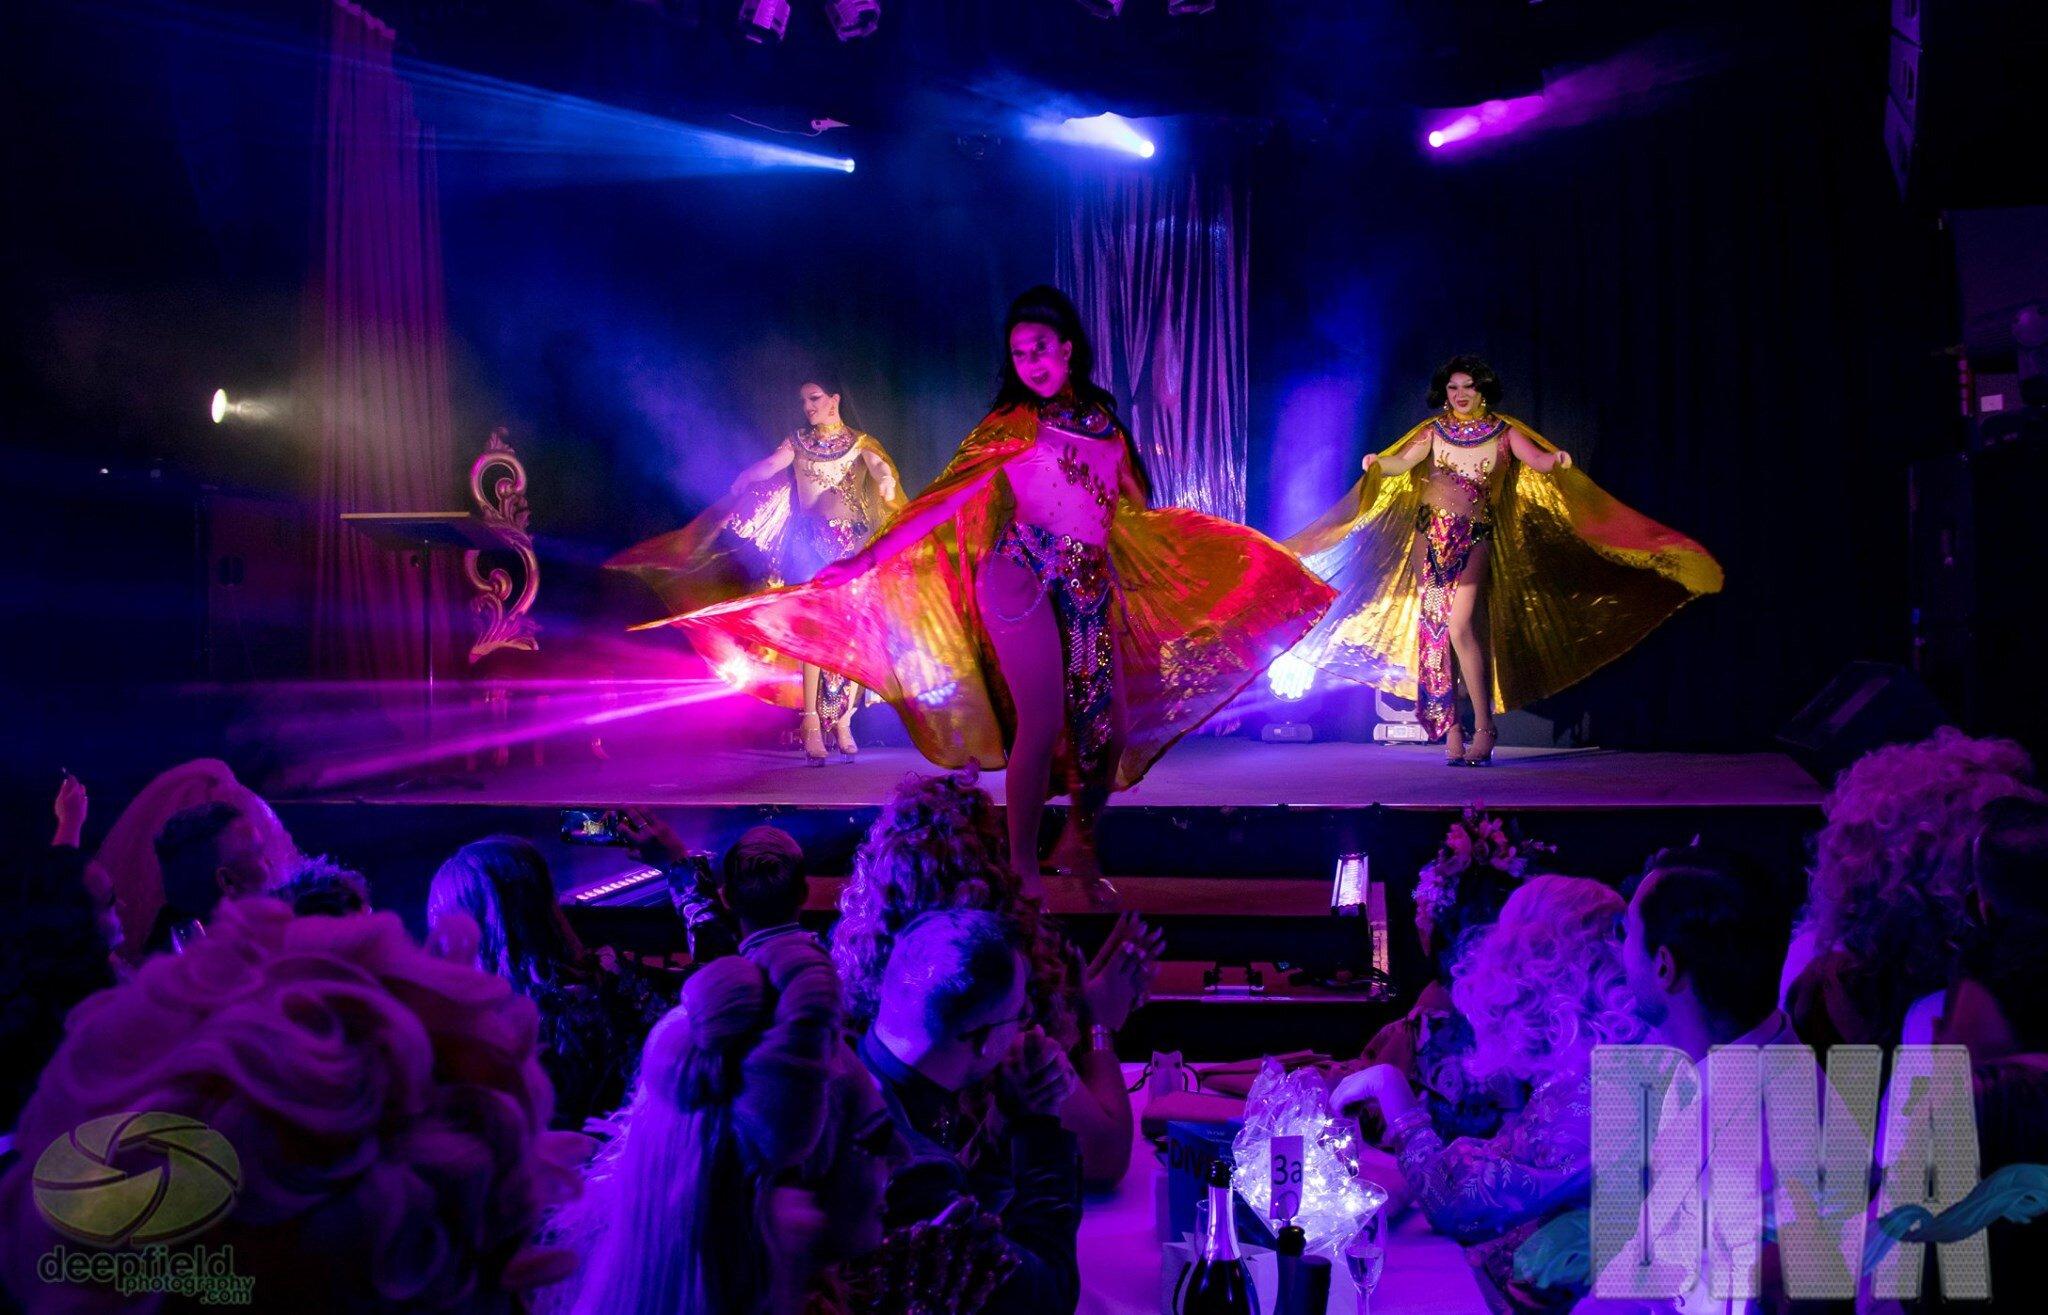 slay-2-stay-danni-issues-mynx-moscato-show-entertainment-diva-awards-sydney-drag-queen-royalty-best-hire-drag-race-australia-3.jpg